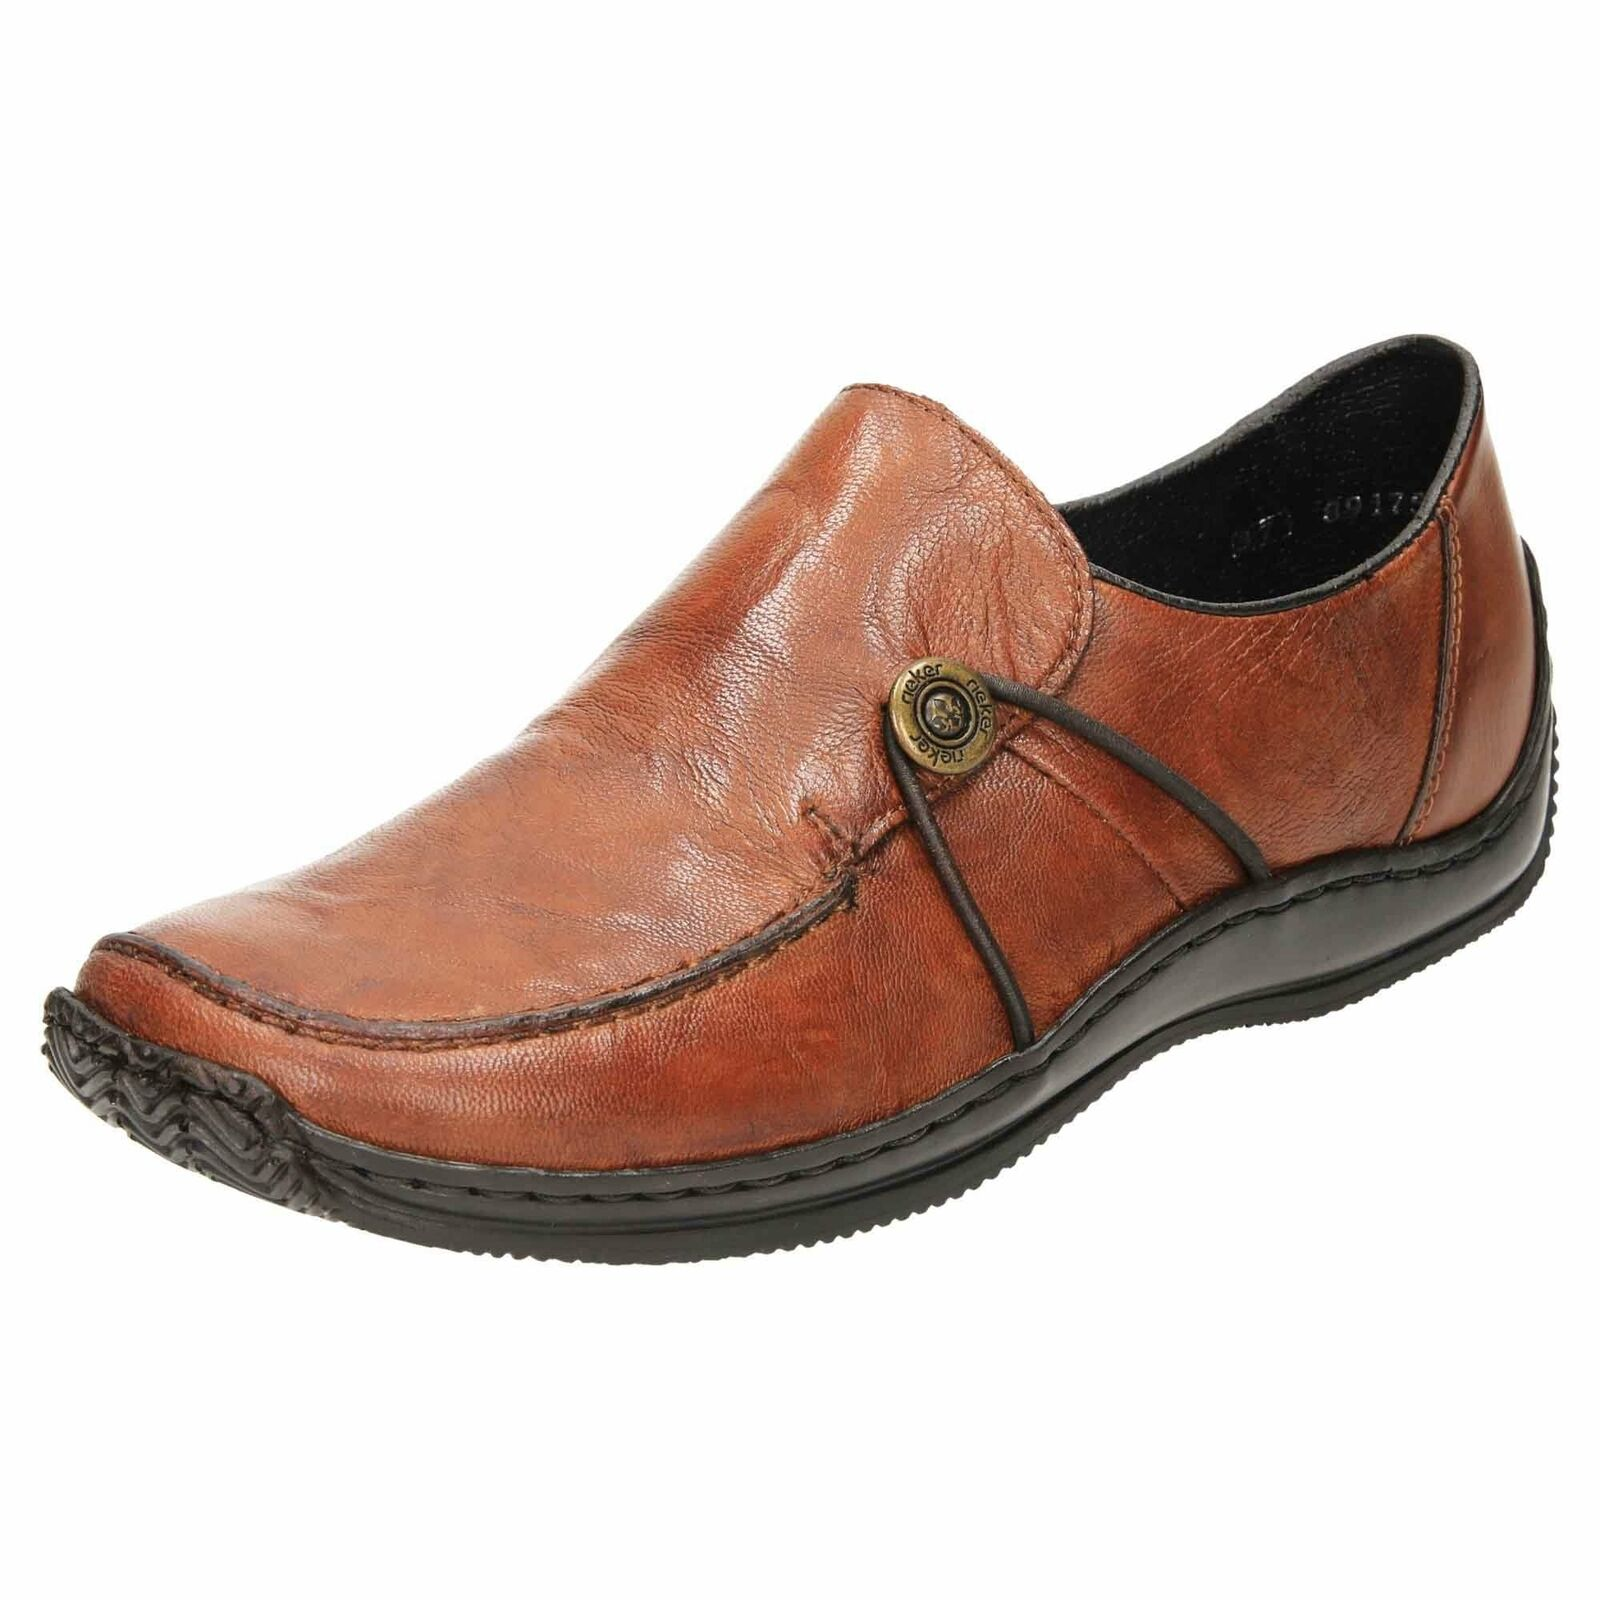 Rieker Slip on Flat Loafer Leather schuhe L1781-22 braun Casual Work Comfort